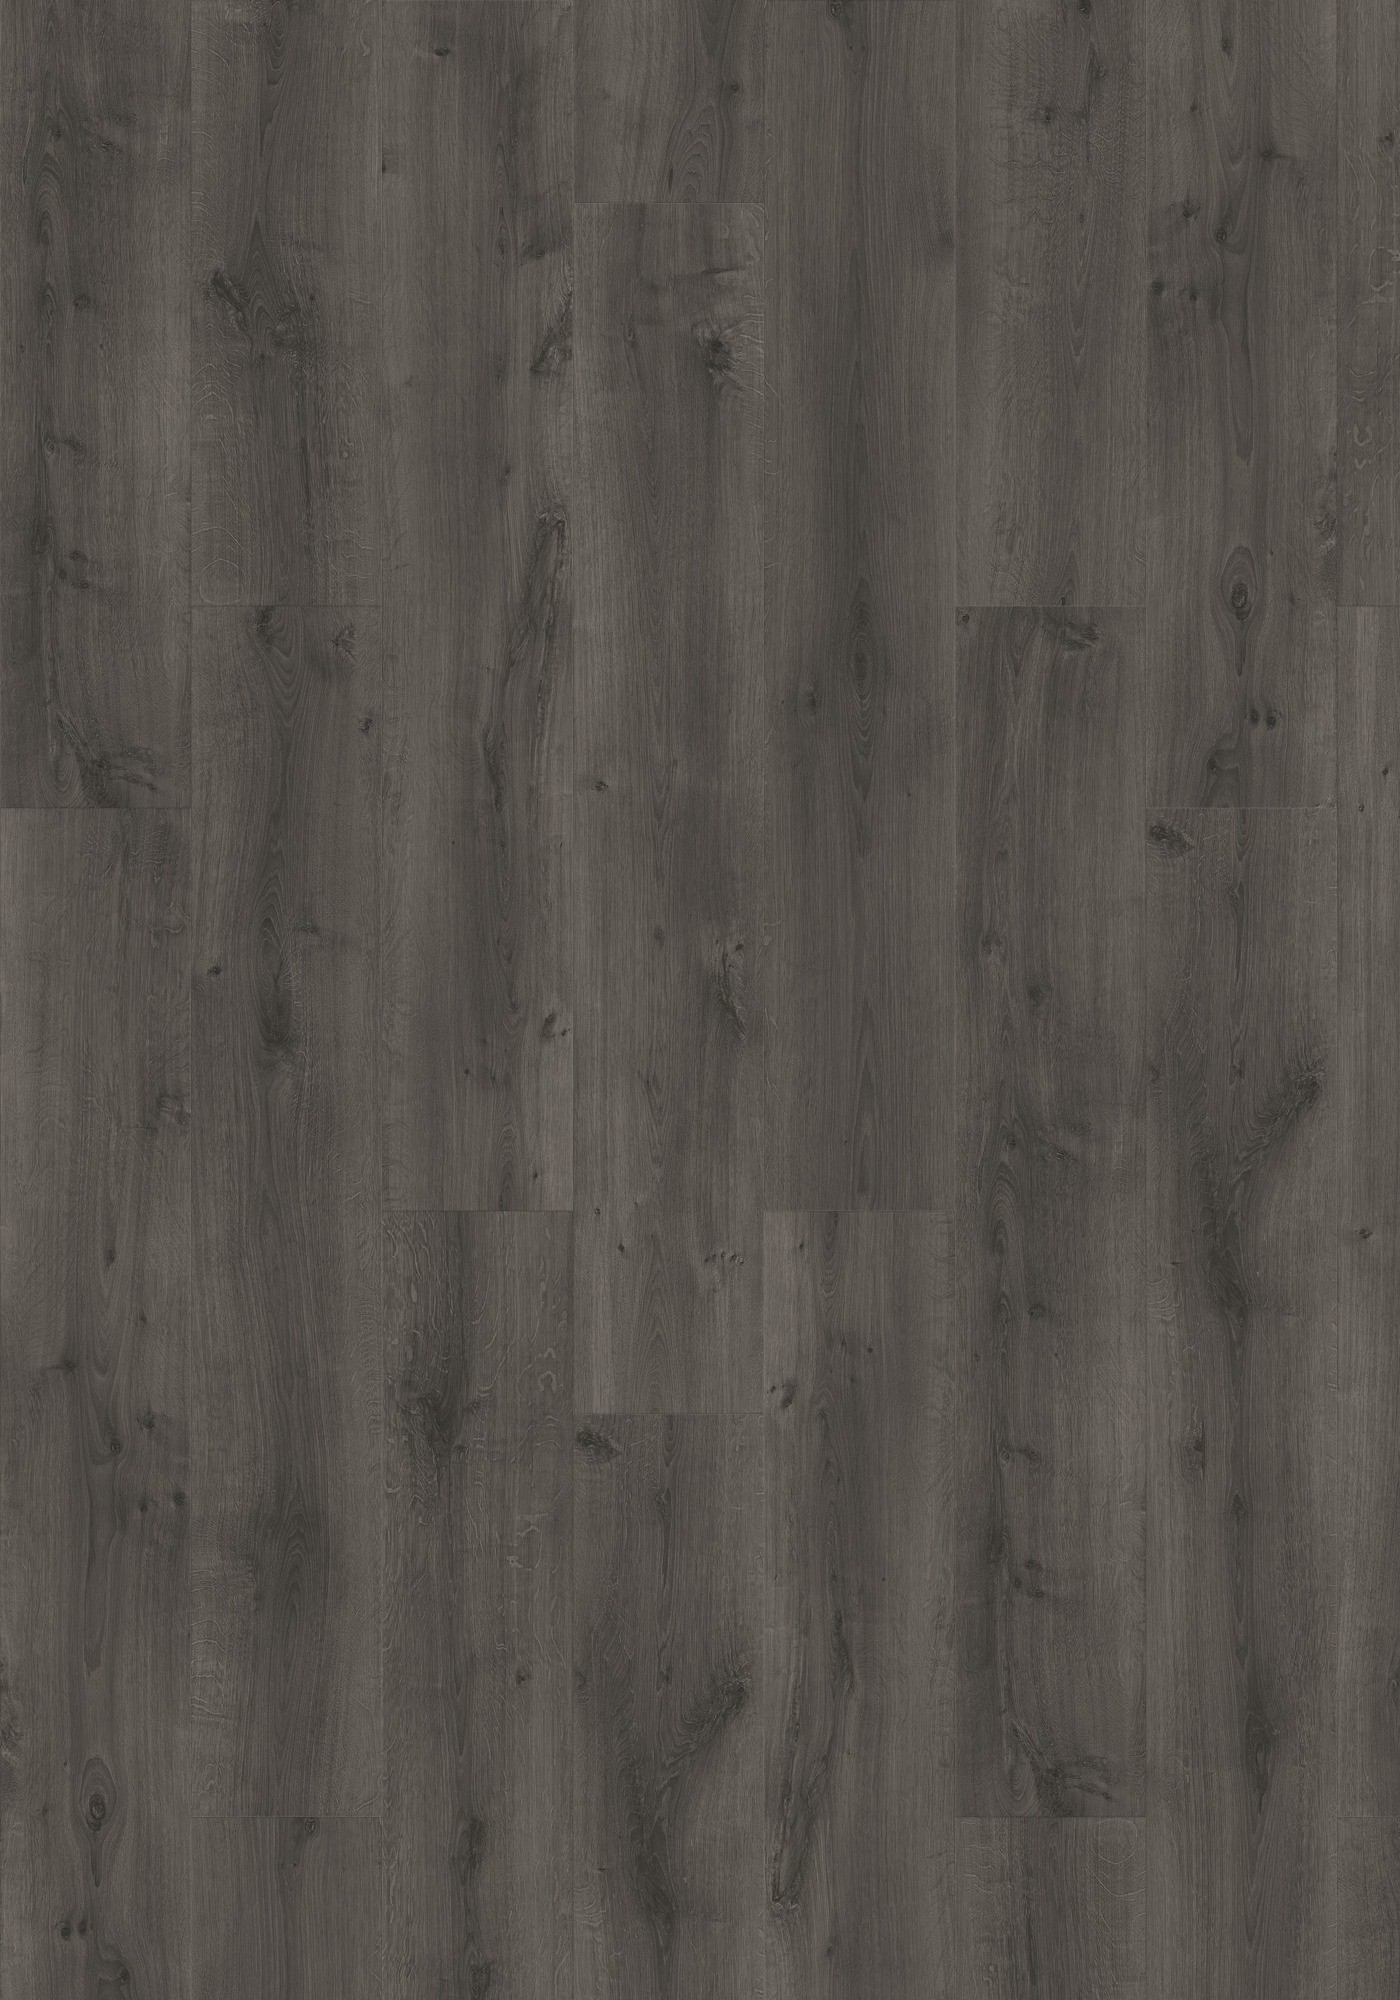 tarkett pvc click vinyl laminaat rustic oak stone donker